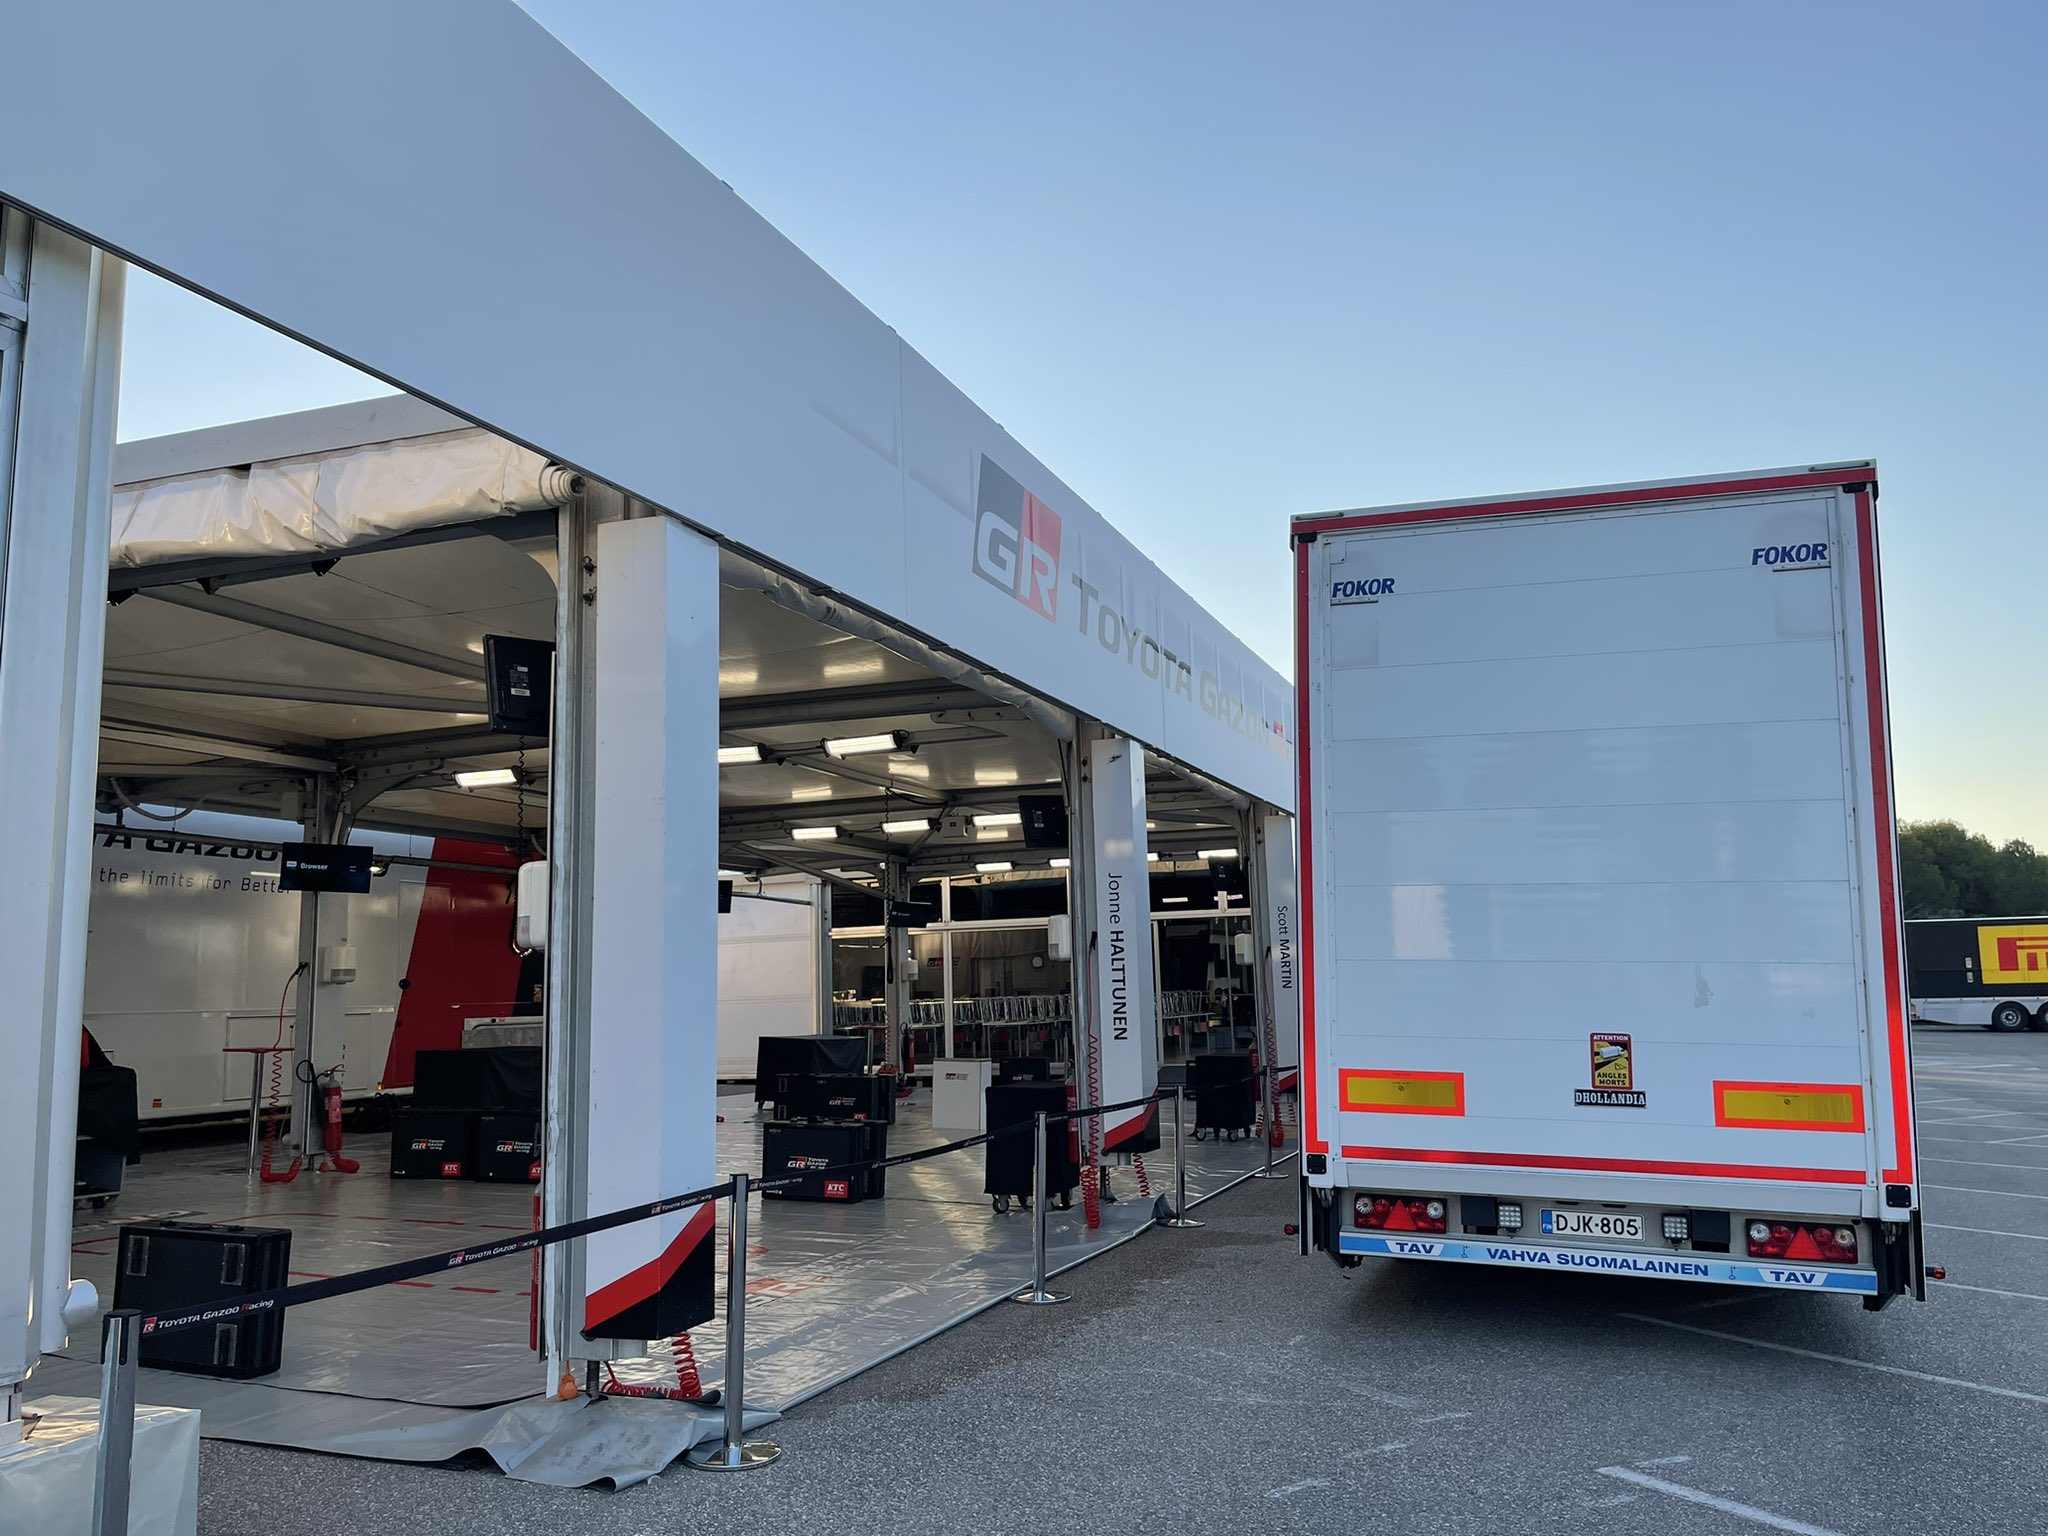 WRC: 56º RallyRACC Catalunya Costa Daurada - Rally de España [14-17 Octubre] - Página 2 FBfGyccXEAE_gHd?format=jpg&name=large